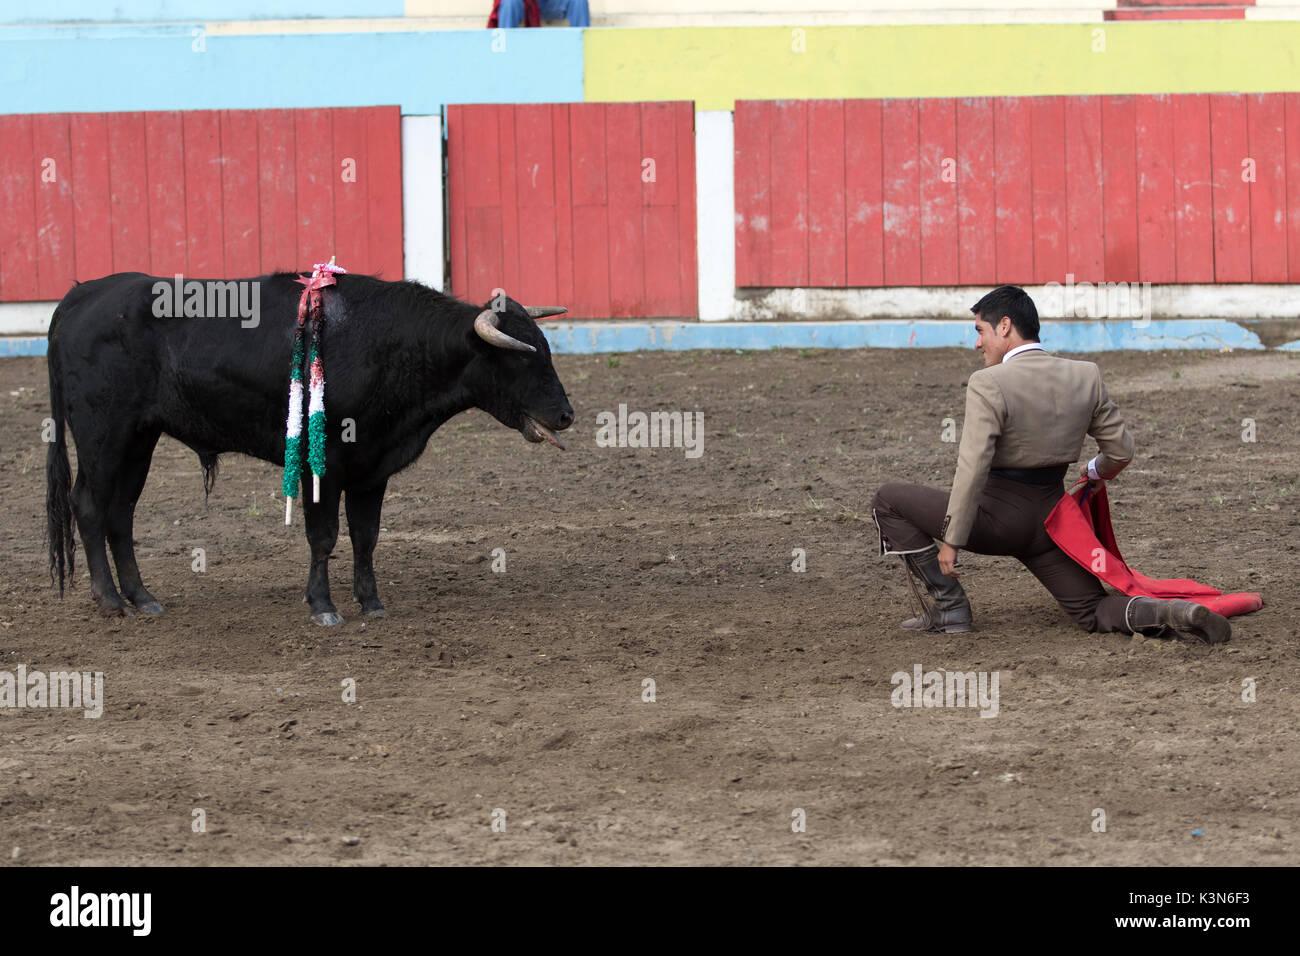 June 18, 2017 Pujili, Ecuador: bullfighter kneels in front of the bull during the ritual - Stock Image